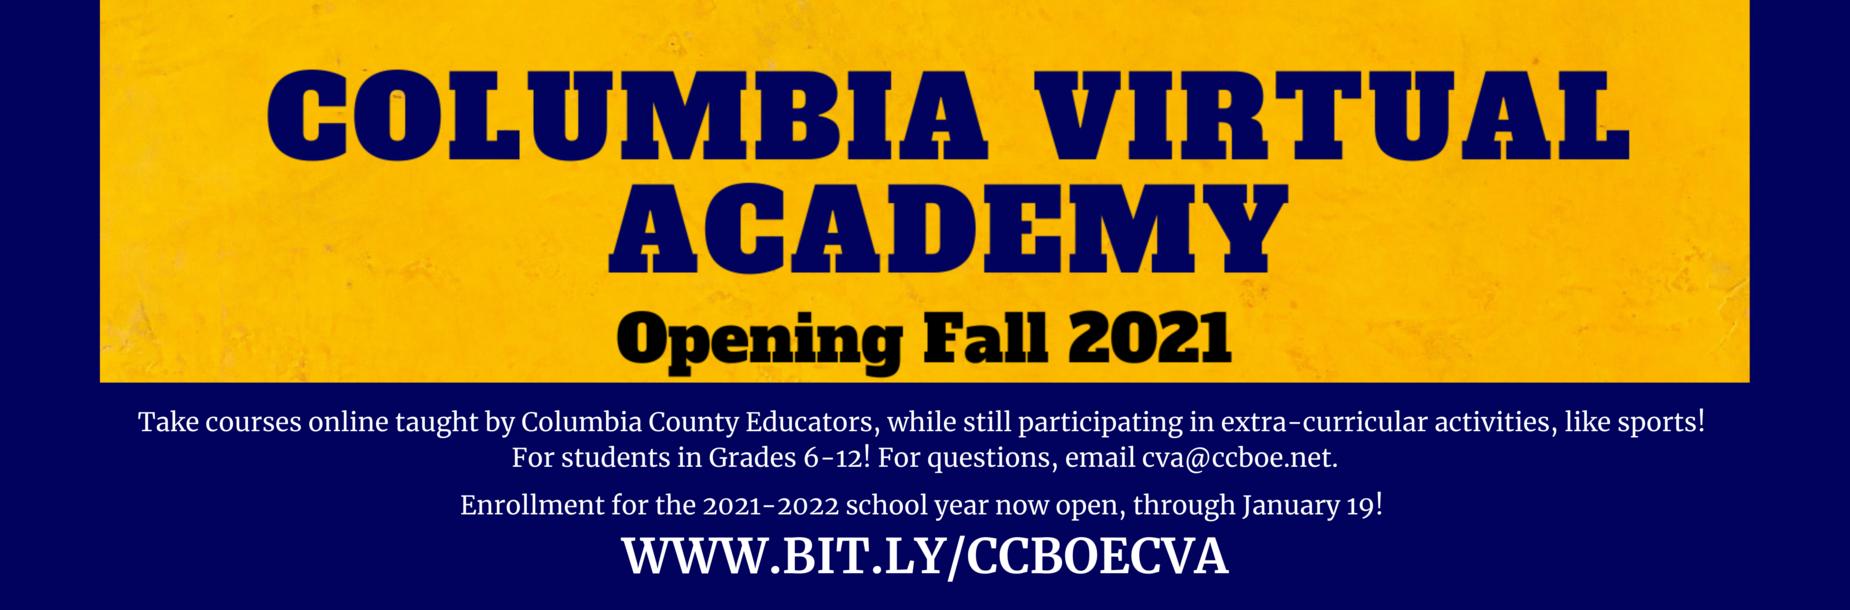 Columbia Virtual Academy www.bit.ly/ccboecva